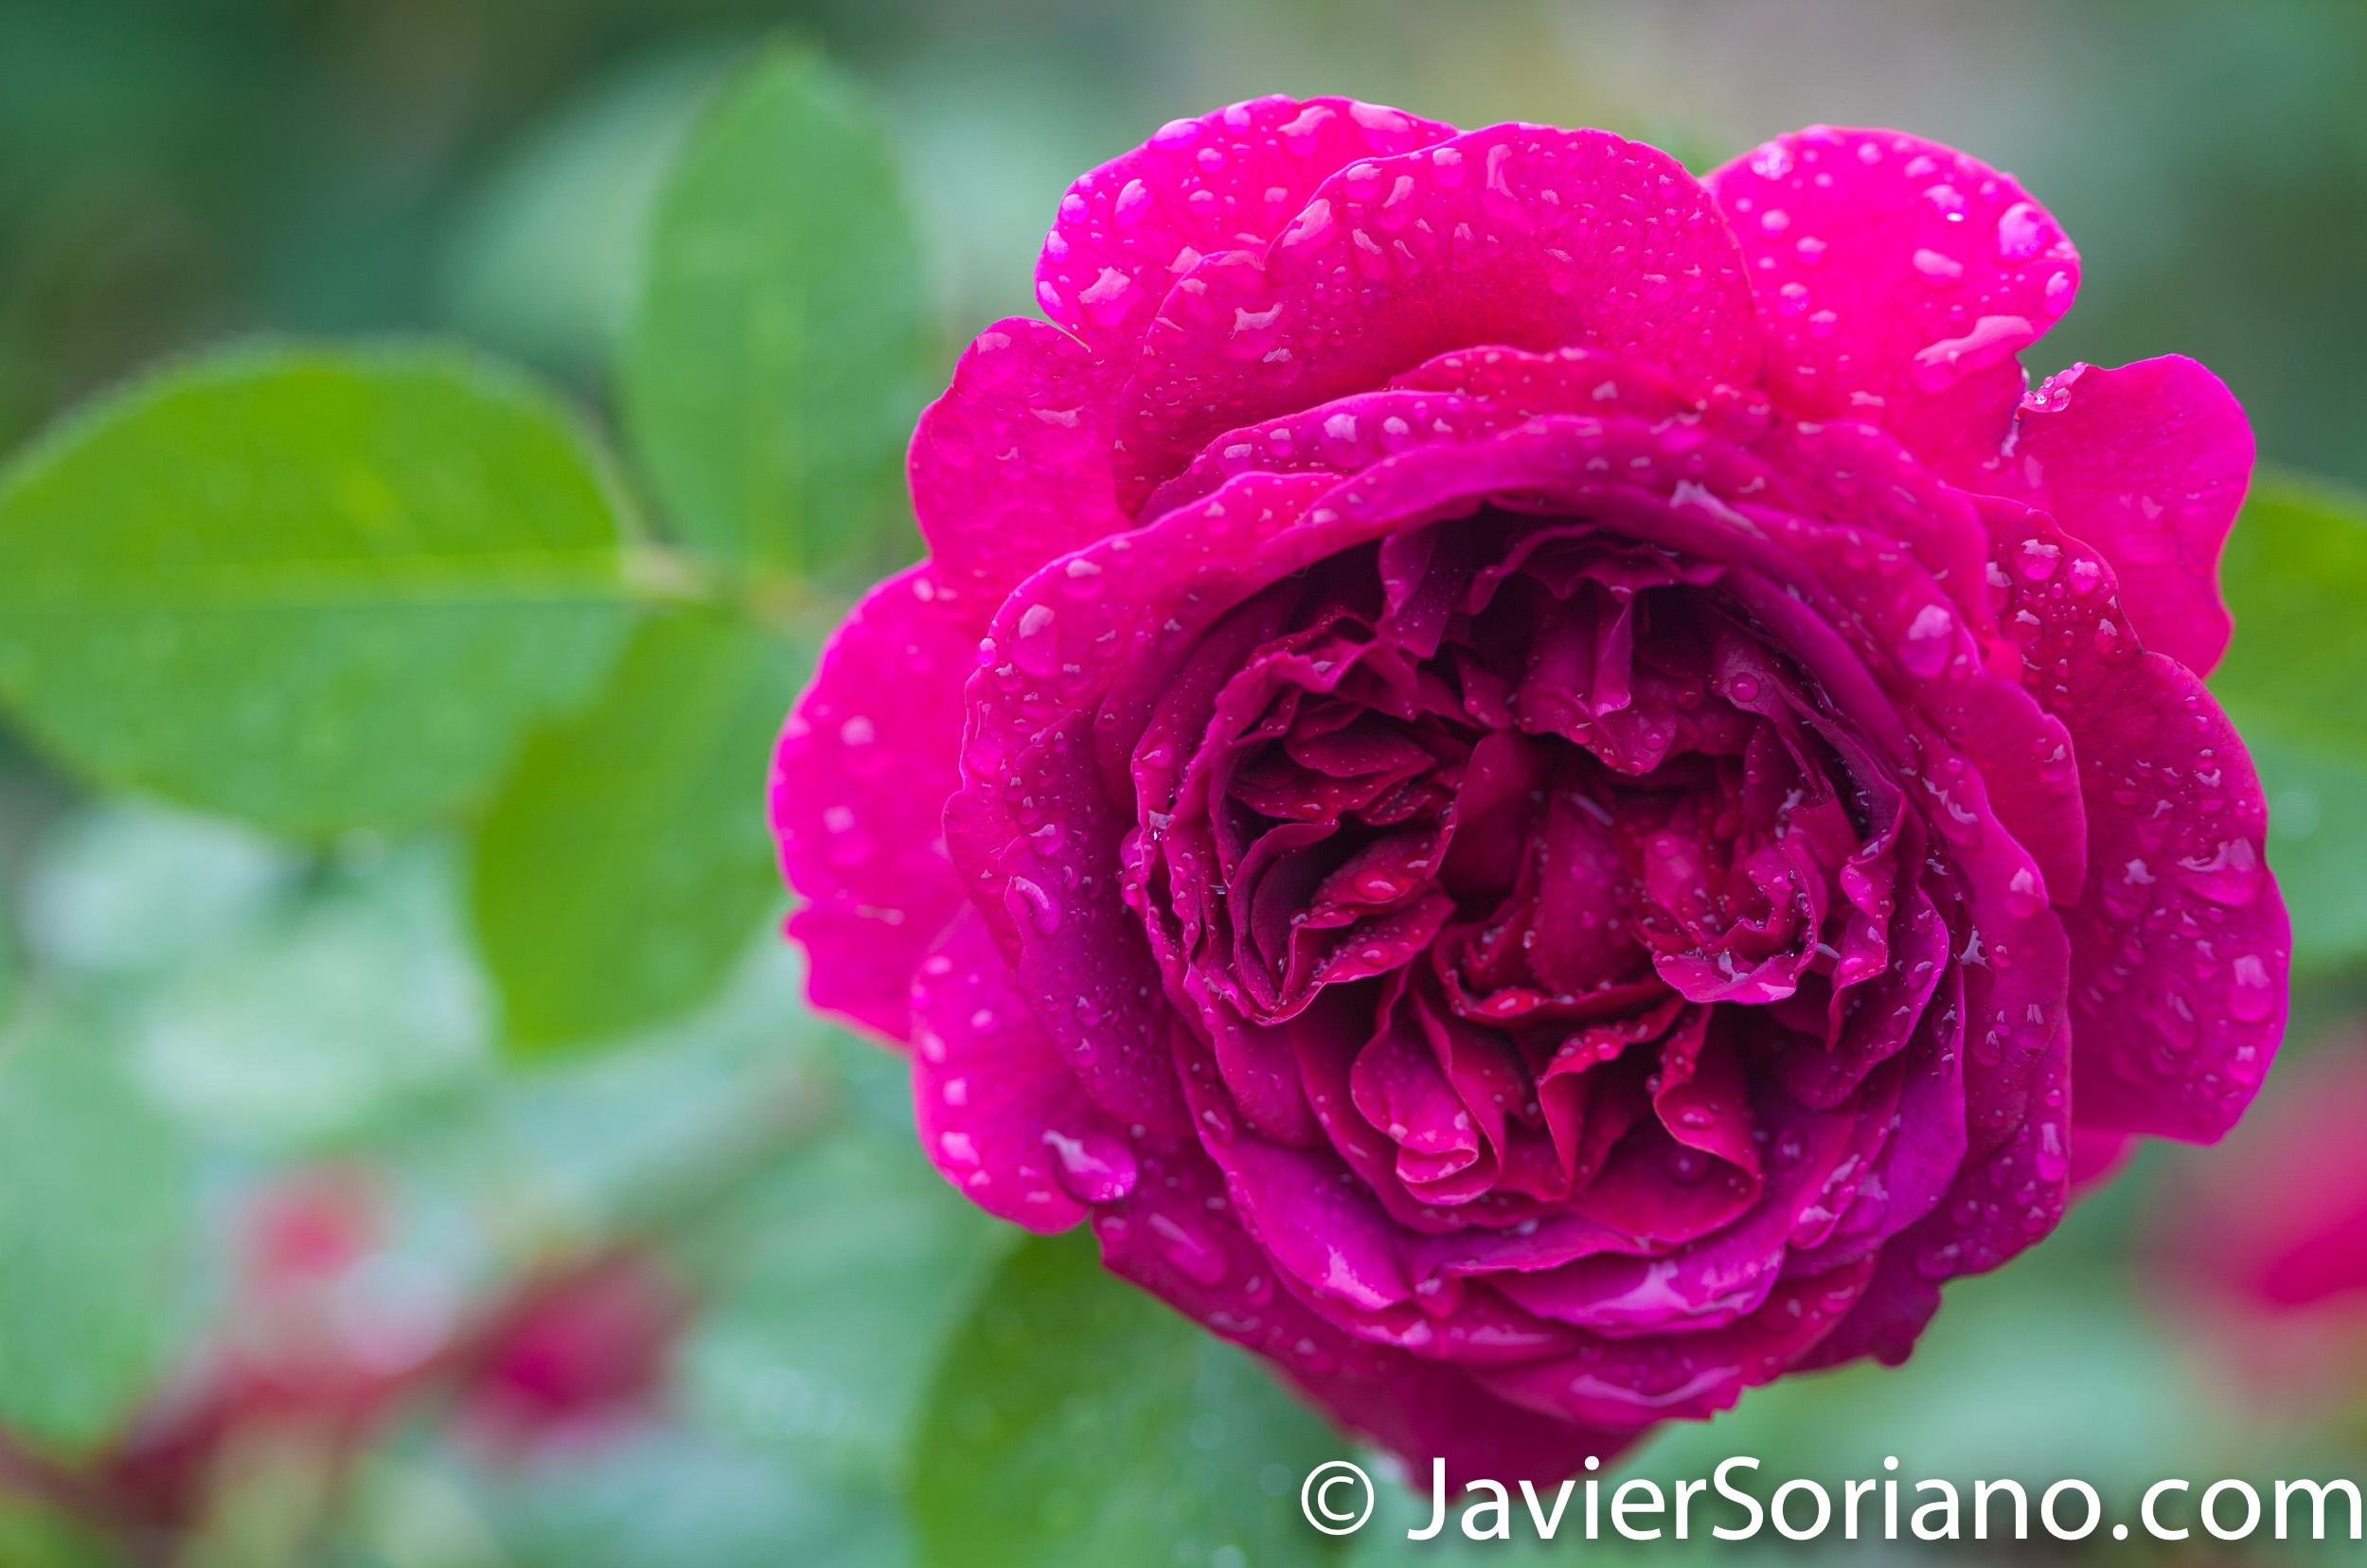 6/6/2017 NYC – A gorgeous rose at the Brooklyn Botanic Garden. Hermosa rosa en el Jardín Botánico de Brooklyn. Photo by Javier Soriano/www.JavierSoriano.com